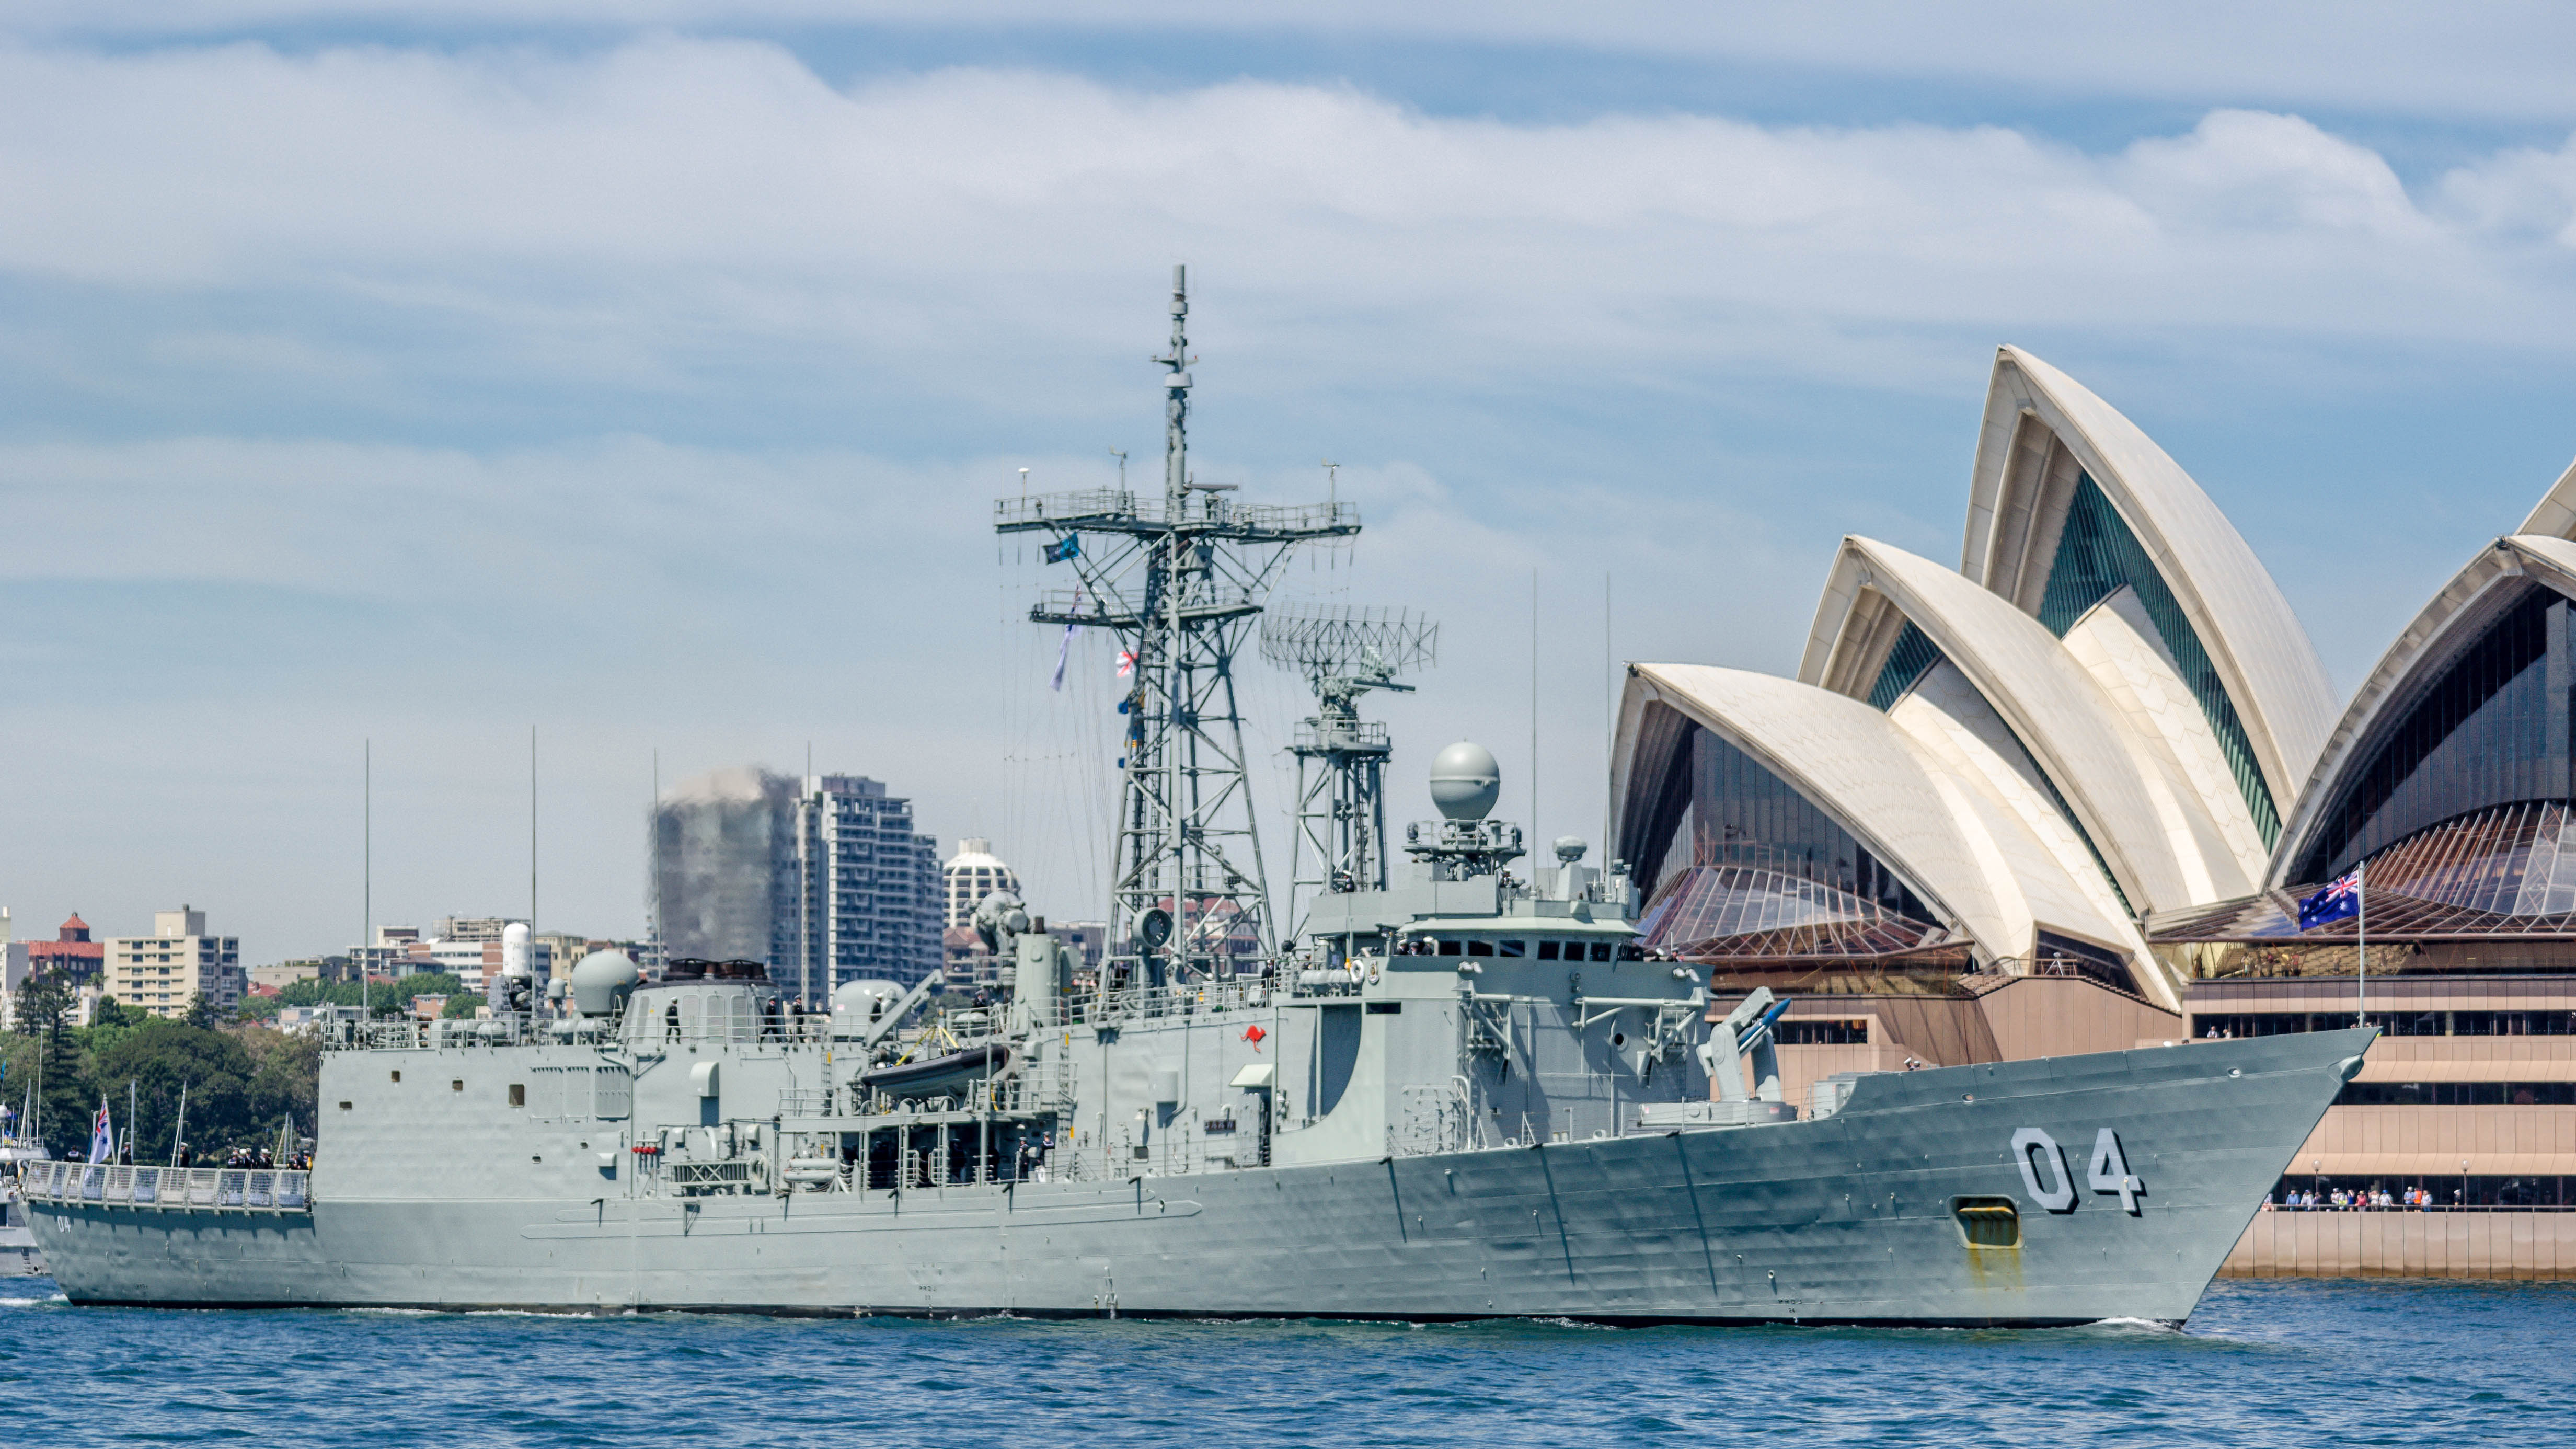 Royal Australian Navy frigate HMAS Darwin (FFG-04) in 2013.